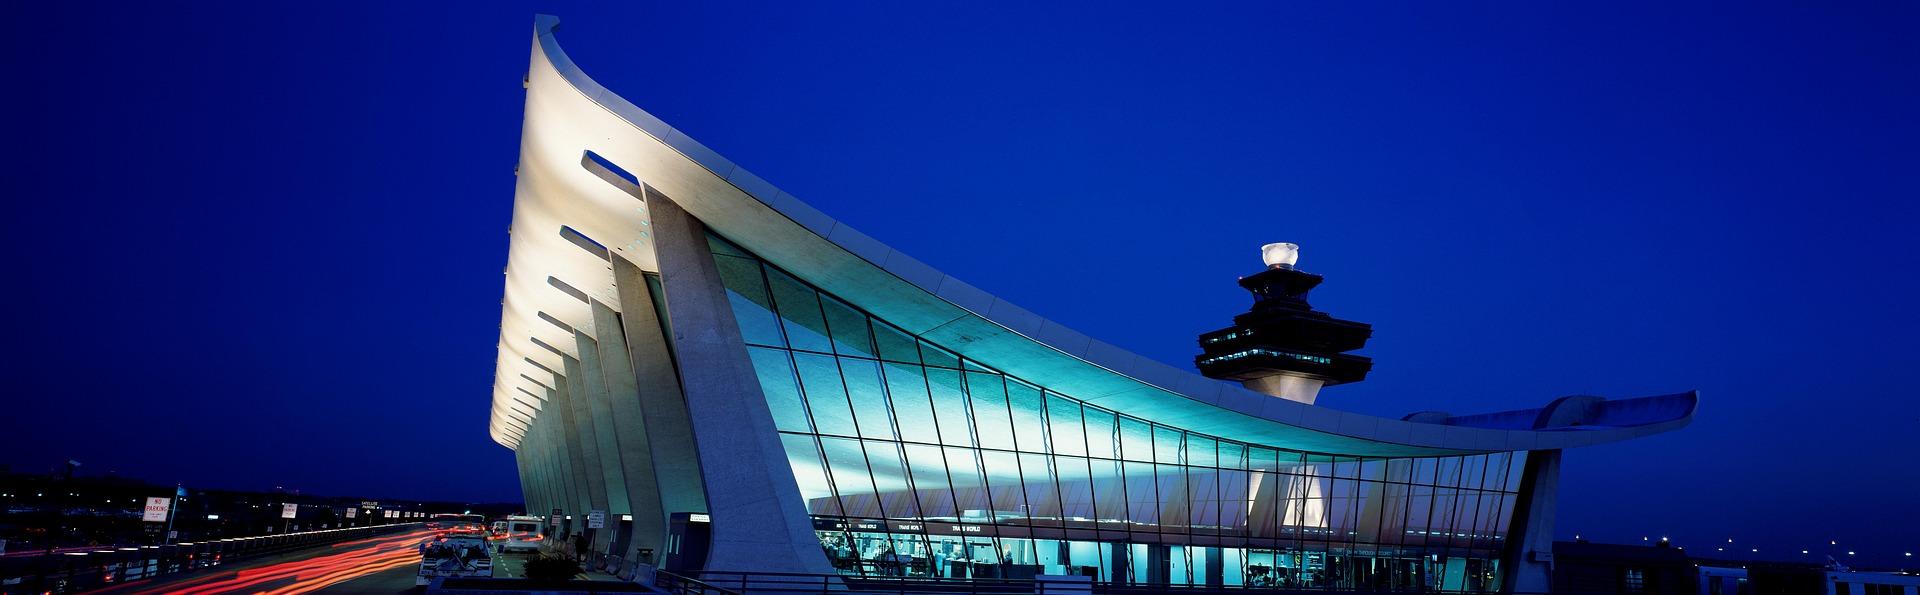 airport, Dulles